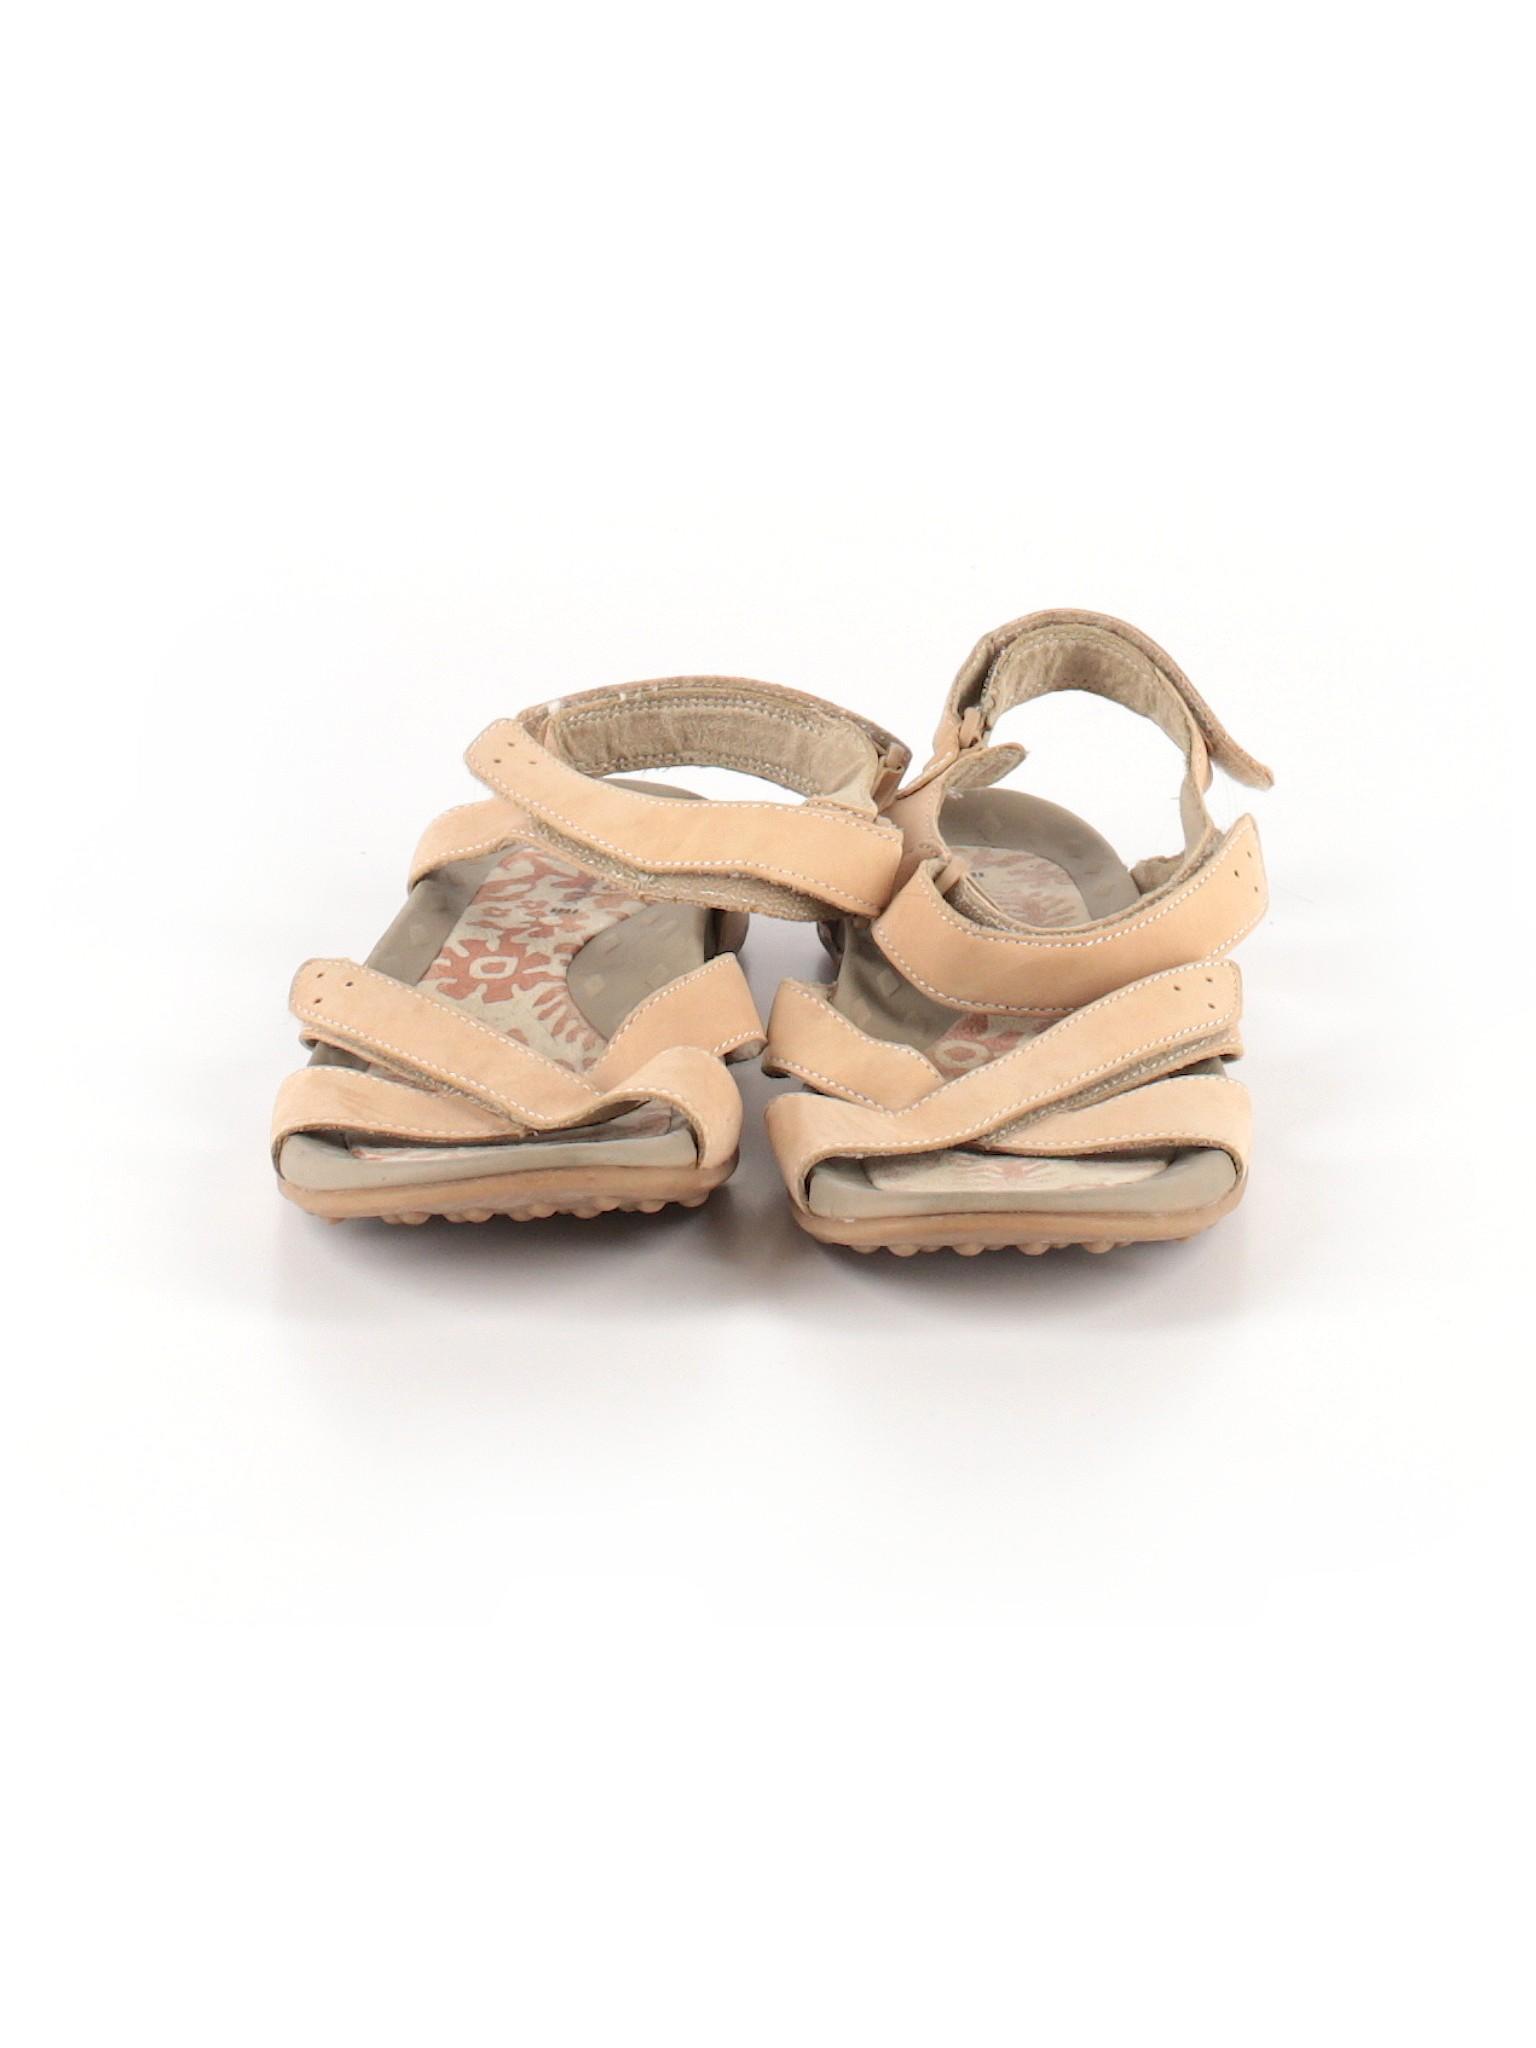 Sandals Sandals promotion Sandals End End Boutique Boutique promotion promotion Lands' Boutique promotion Lands' End Lands' Boutique ARq5wES